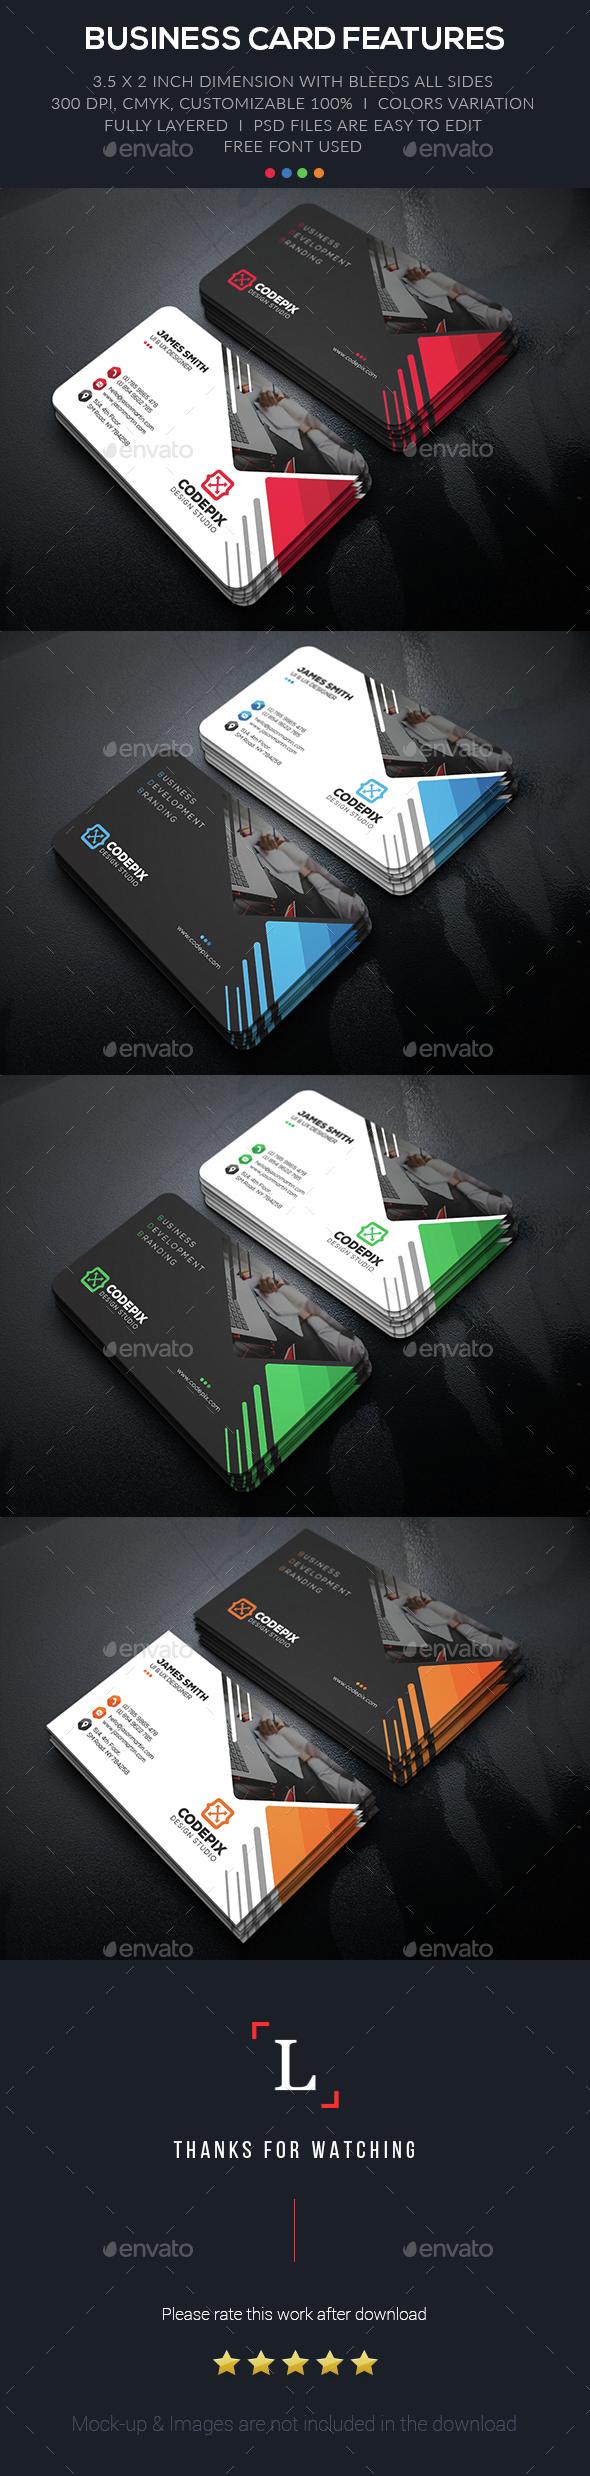 Development Business Card - Business Cards Print Templates